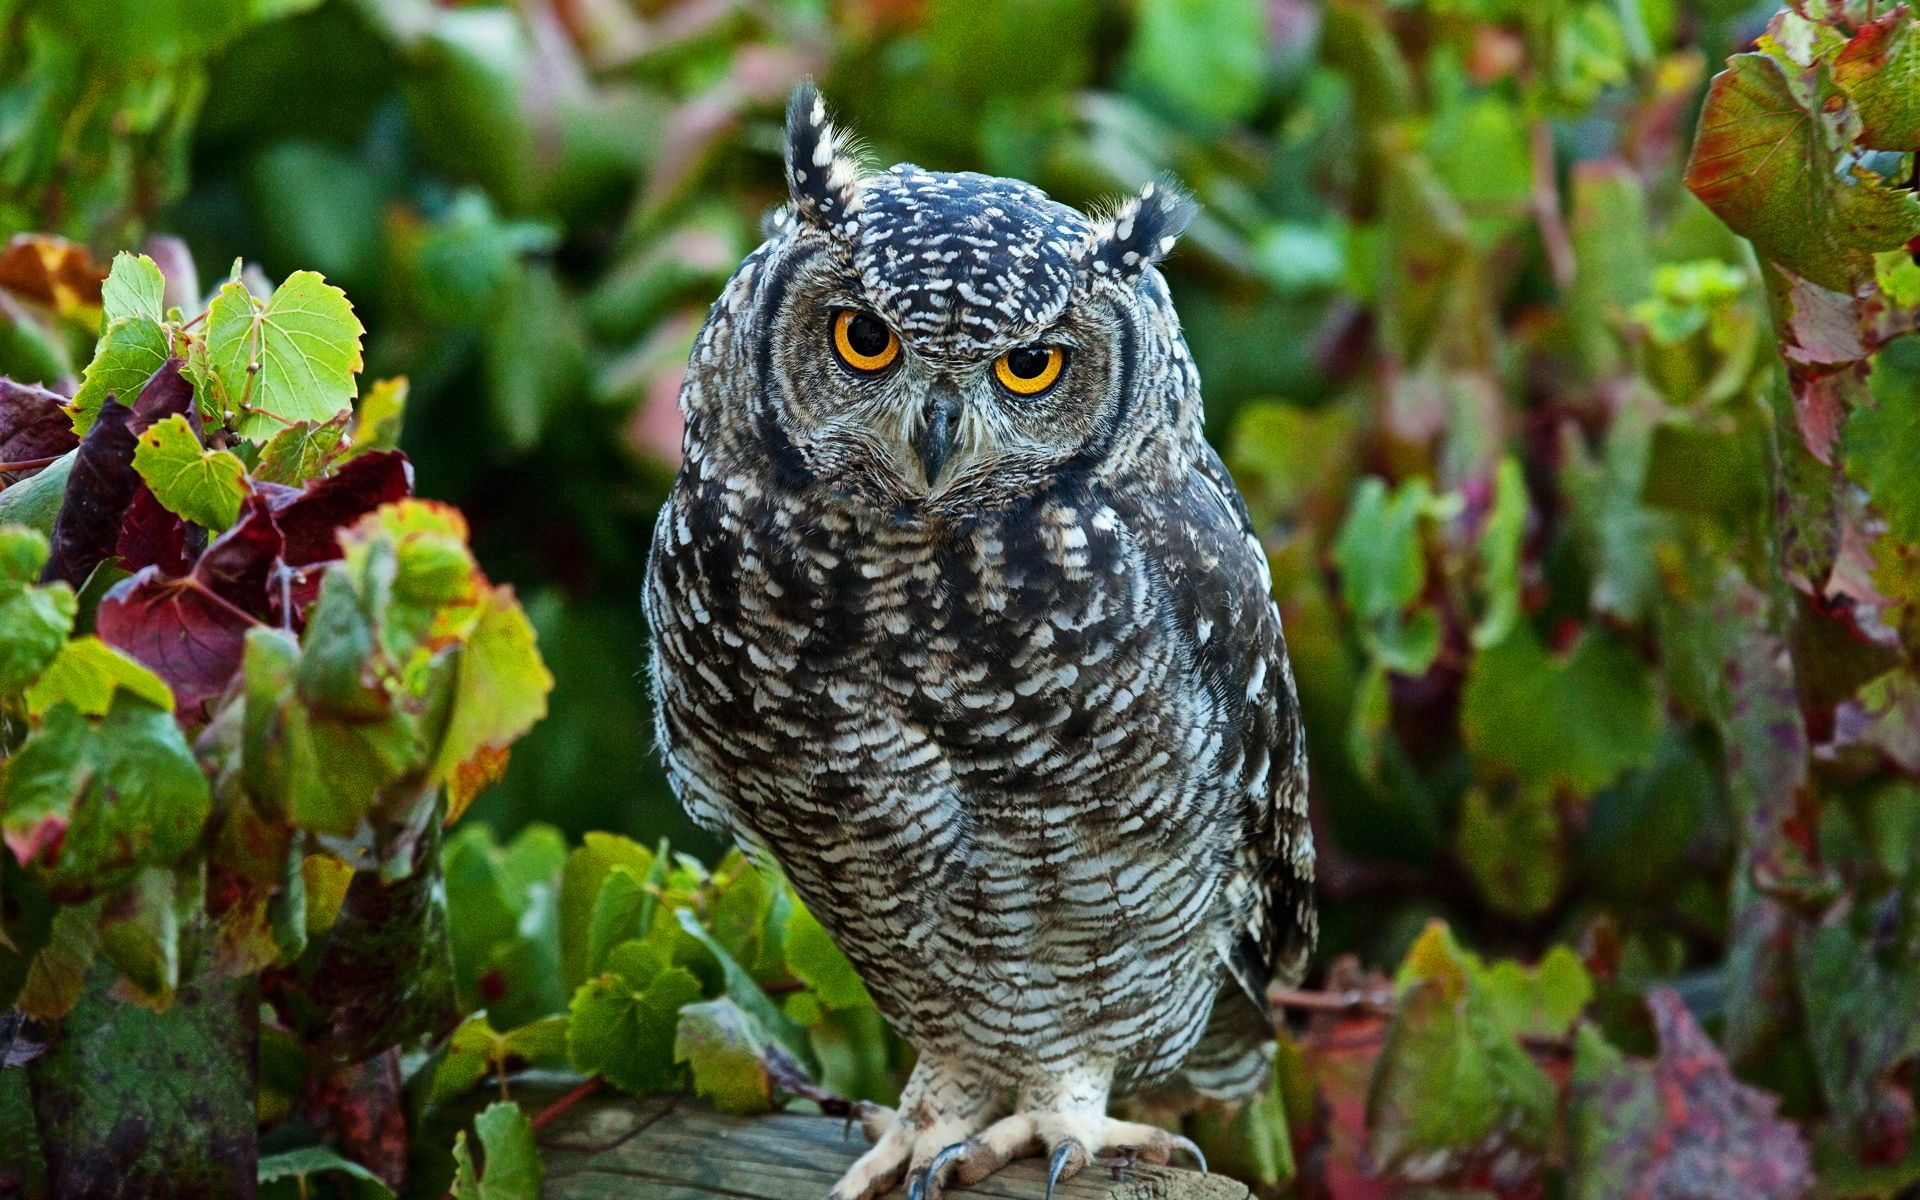 Cute owl wallpaper download widescreen wallpapers wallpaper cute owl wallpaper download widescreen wallpapers wallpaper background hd wallpapers and free downloads hd wallpapers for desktop tablet voltagebd Images